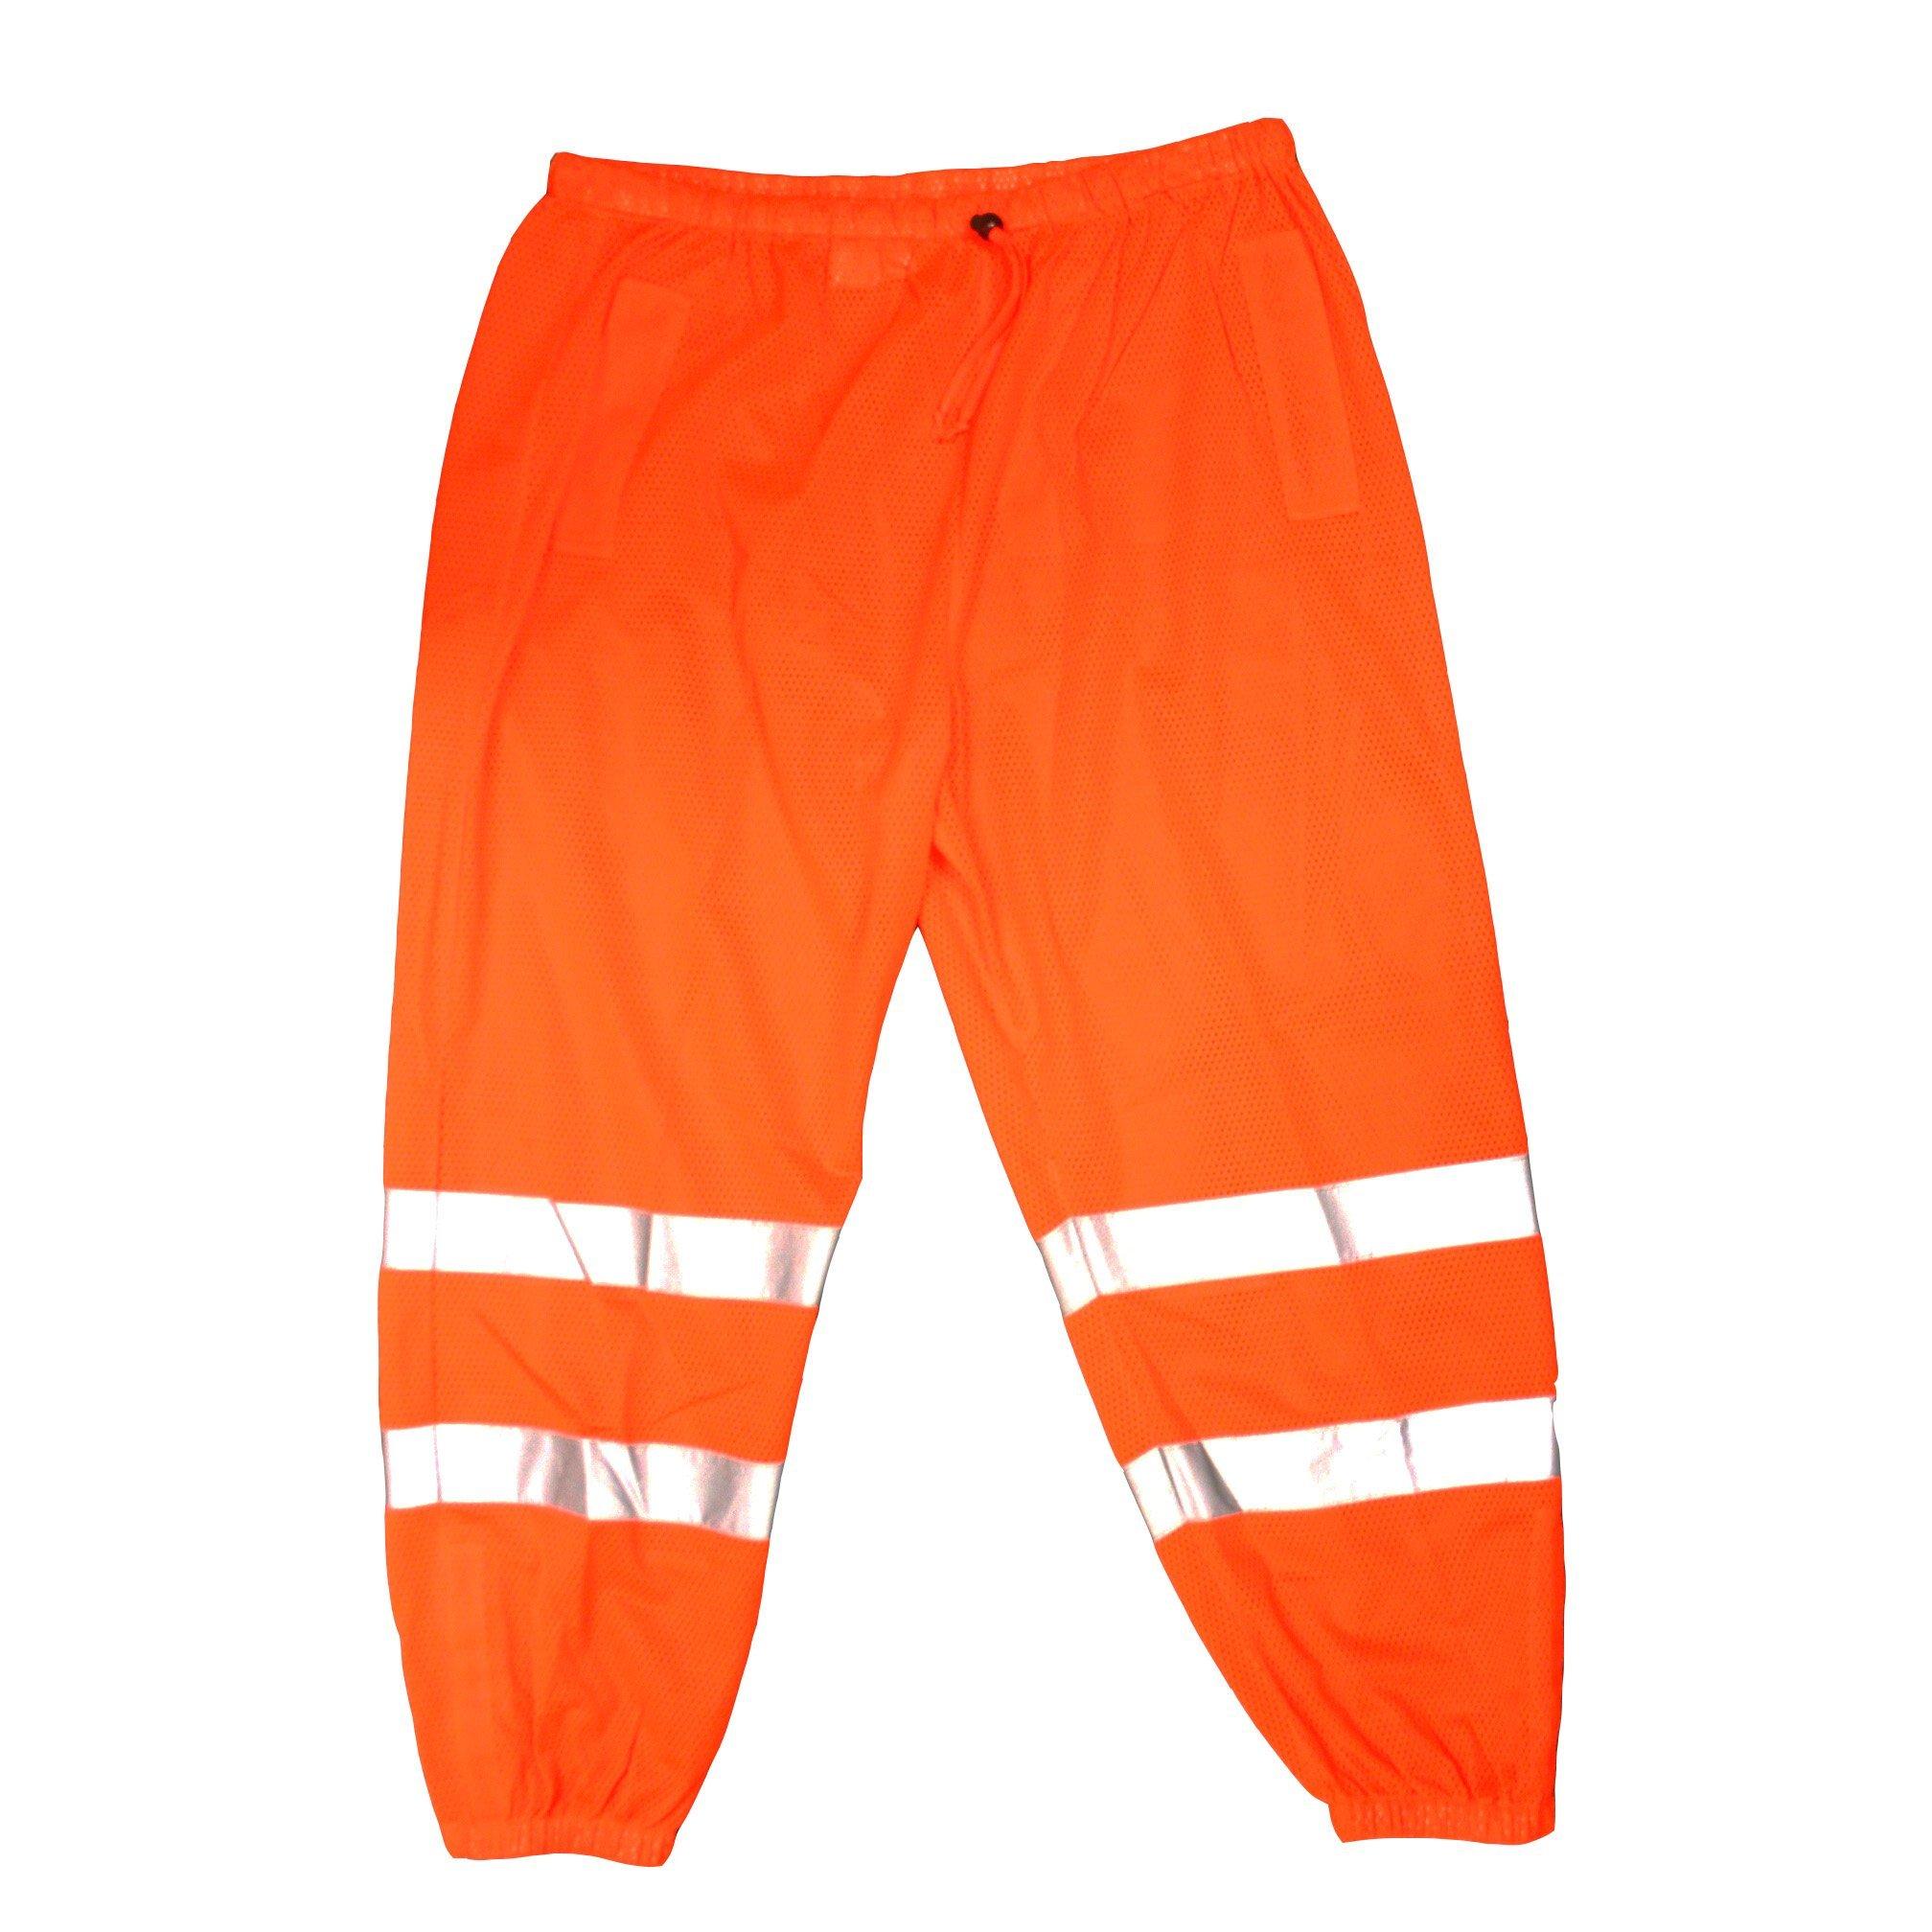 Cordova Safety Products P100L/XL Cor-Brite Mesh Pants, Large/X-Large, Hi-Vis Orange